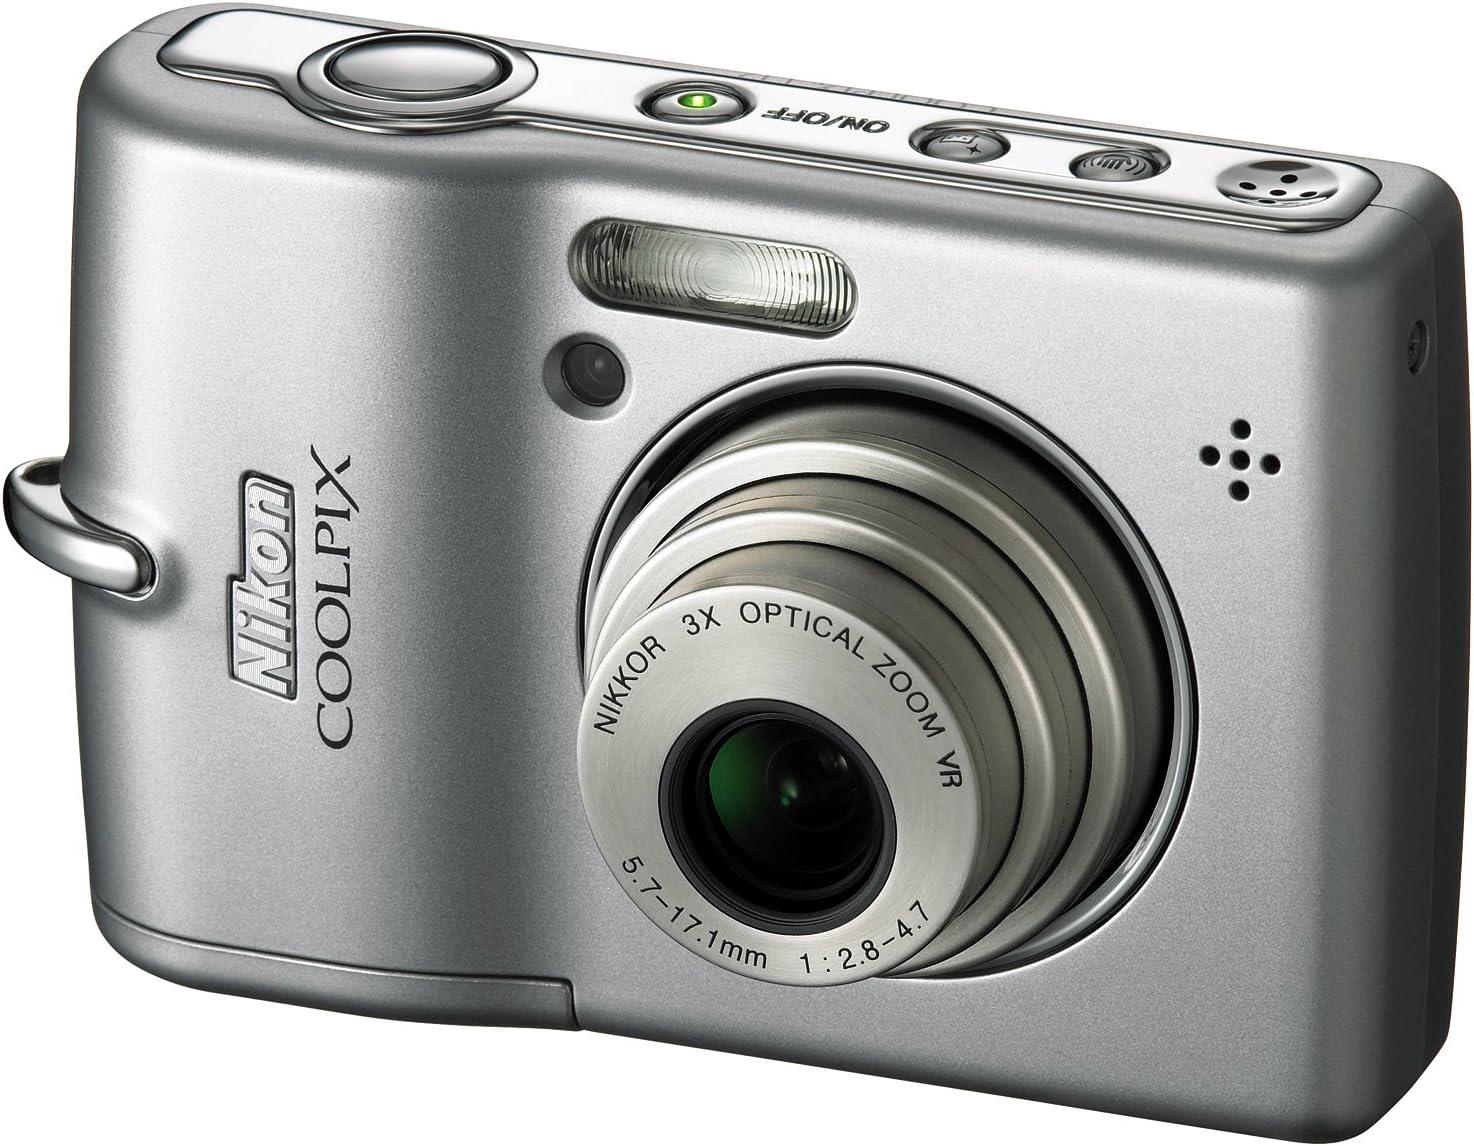 Pro Video Stabilizing Handle Grip for Nikon Coolpix 4200 Vertical Shoe Mount Stabilizer Handle